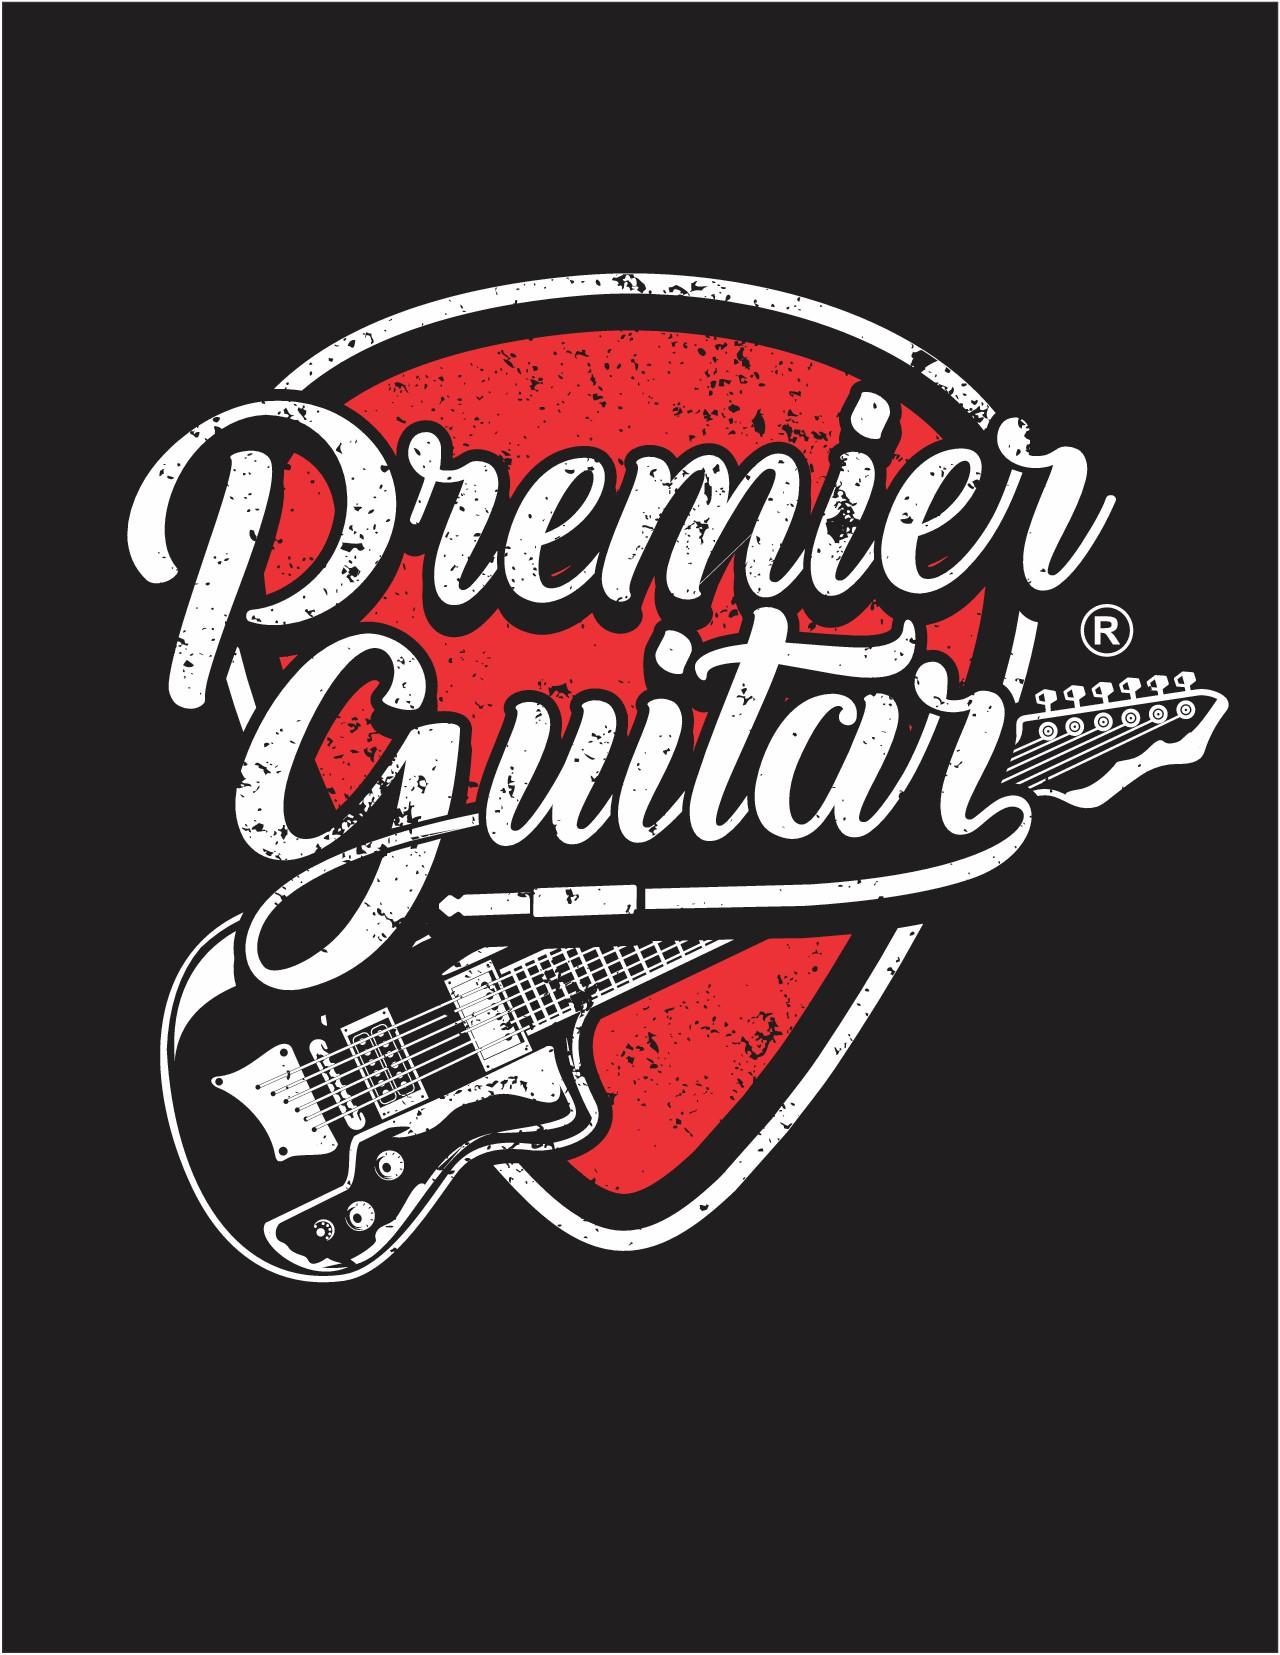 T-Shirt Design for Premier Guitar